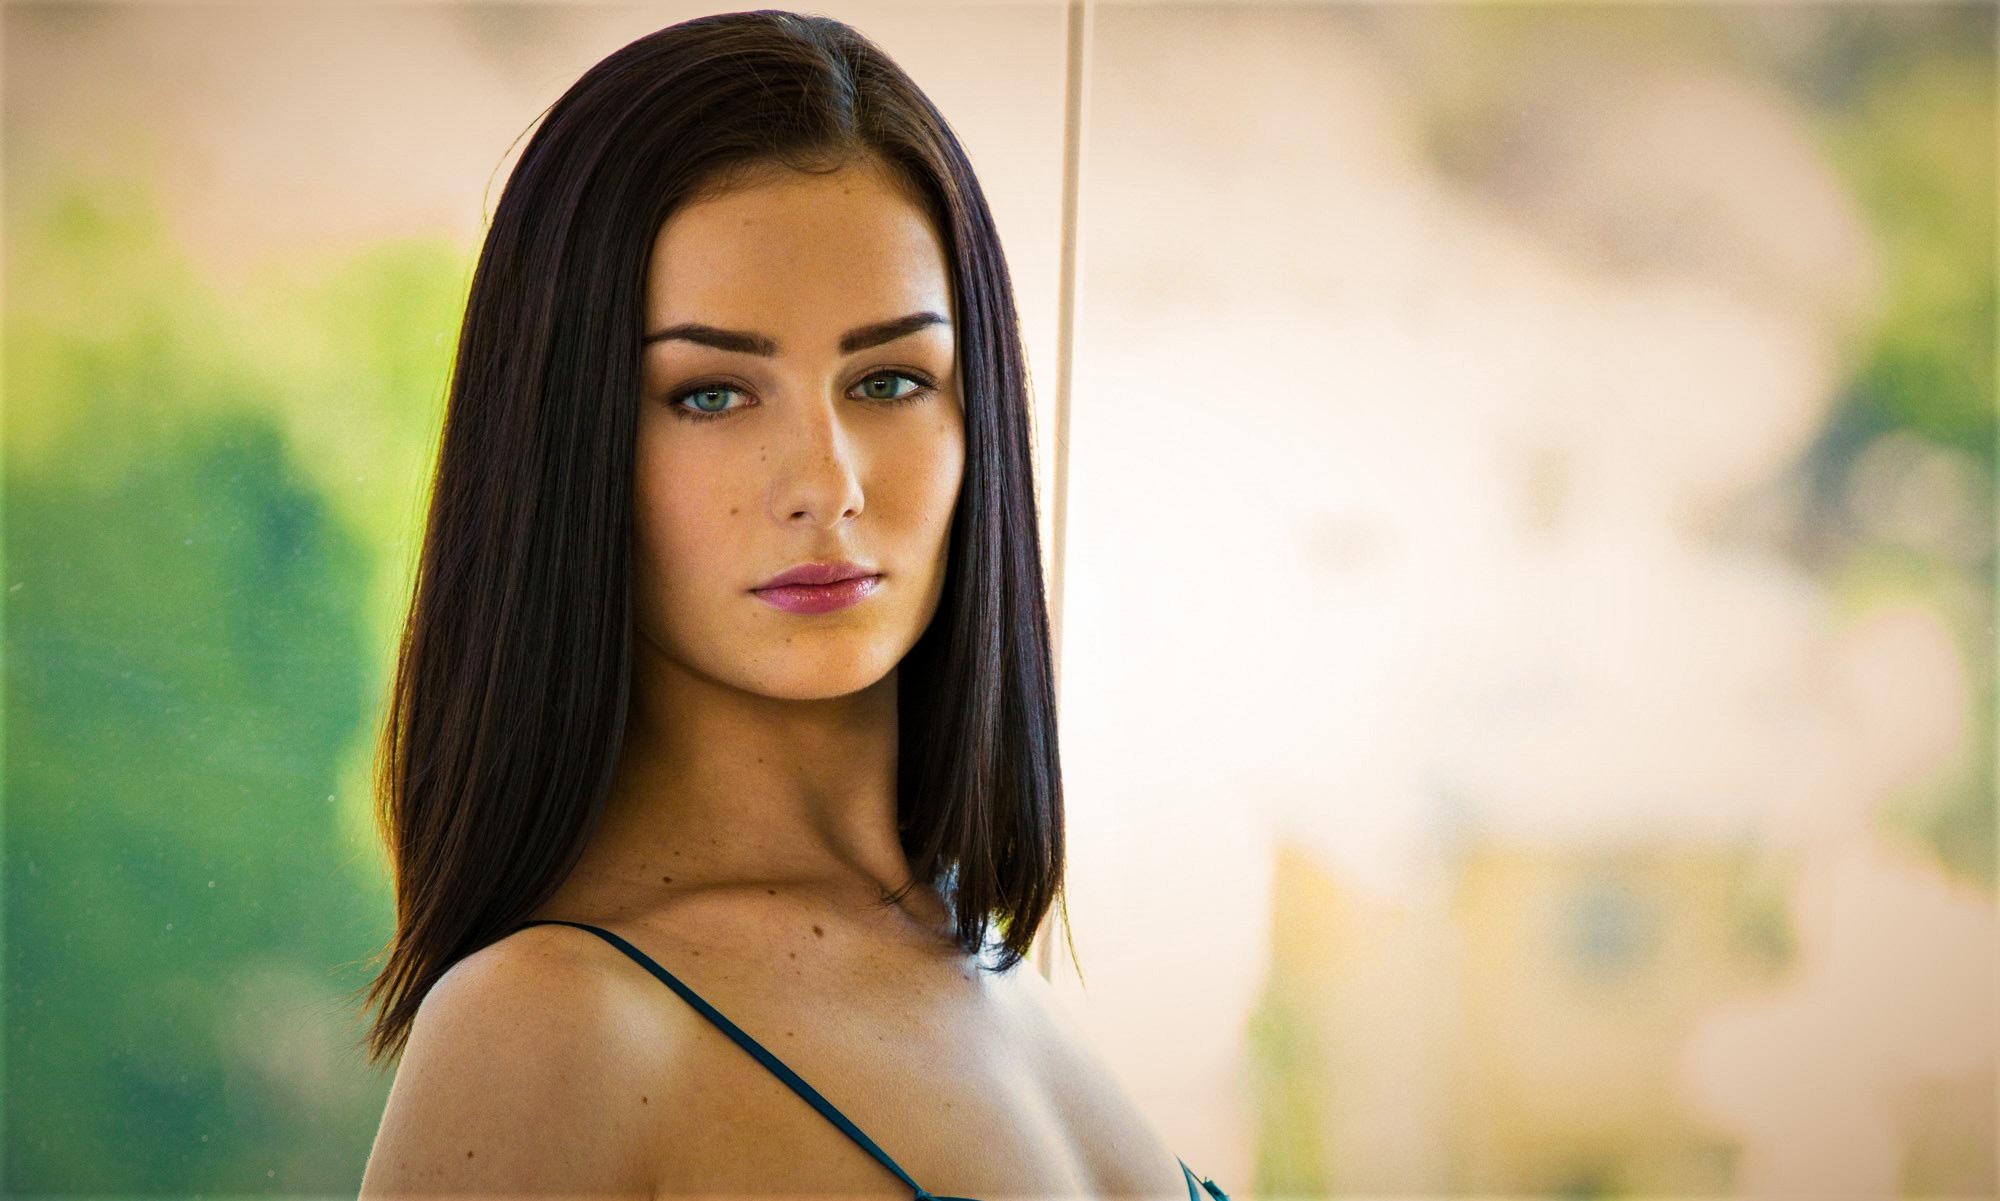 Amanda Lane Nude wallpaper : amanda lane, model, portrait, black hair, women